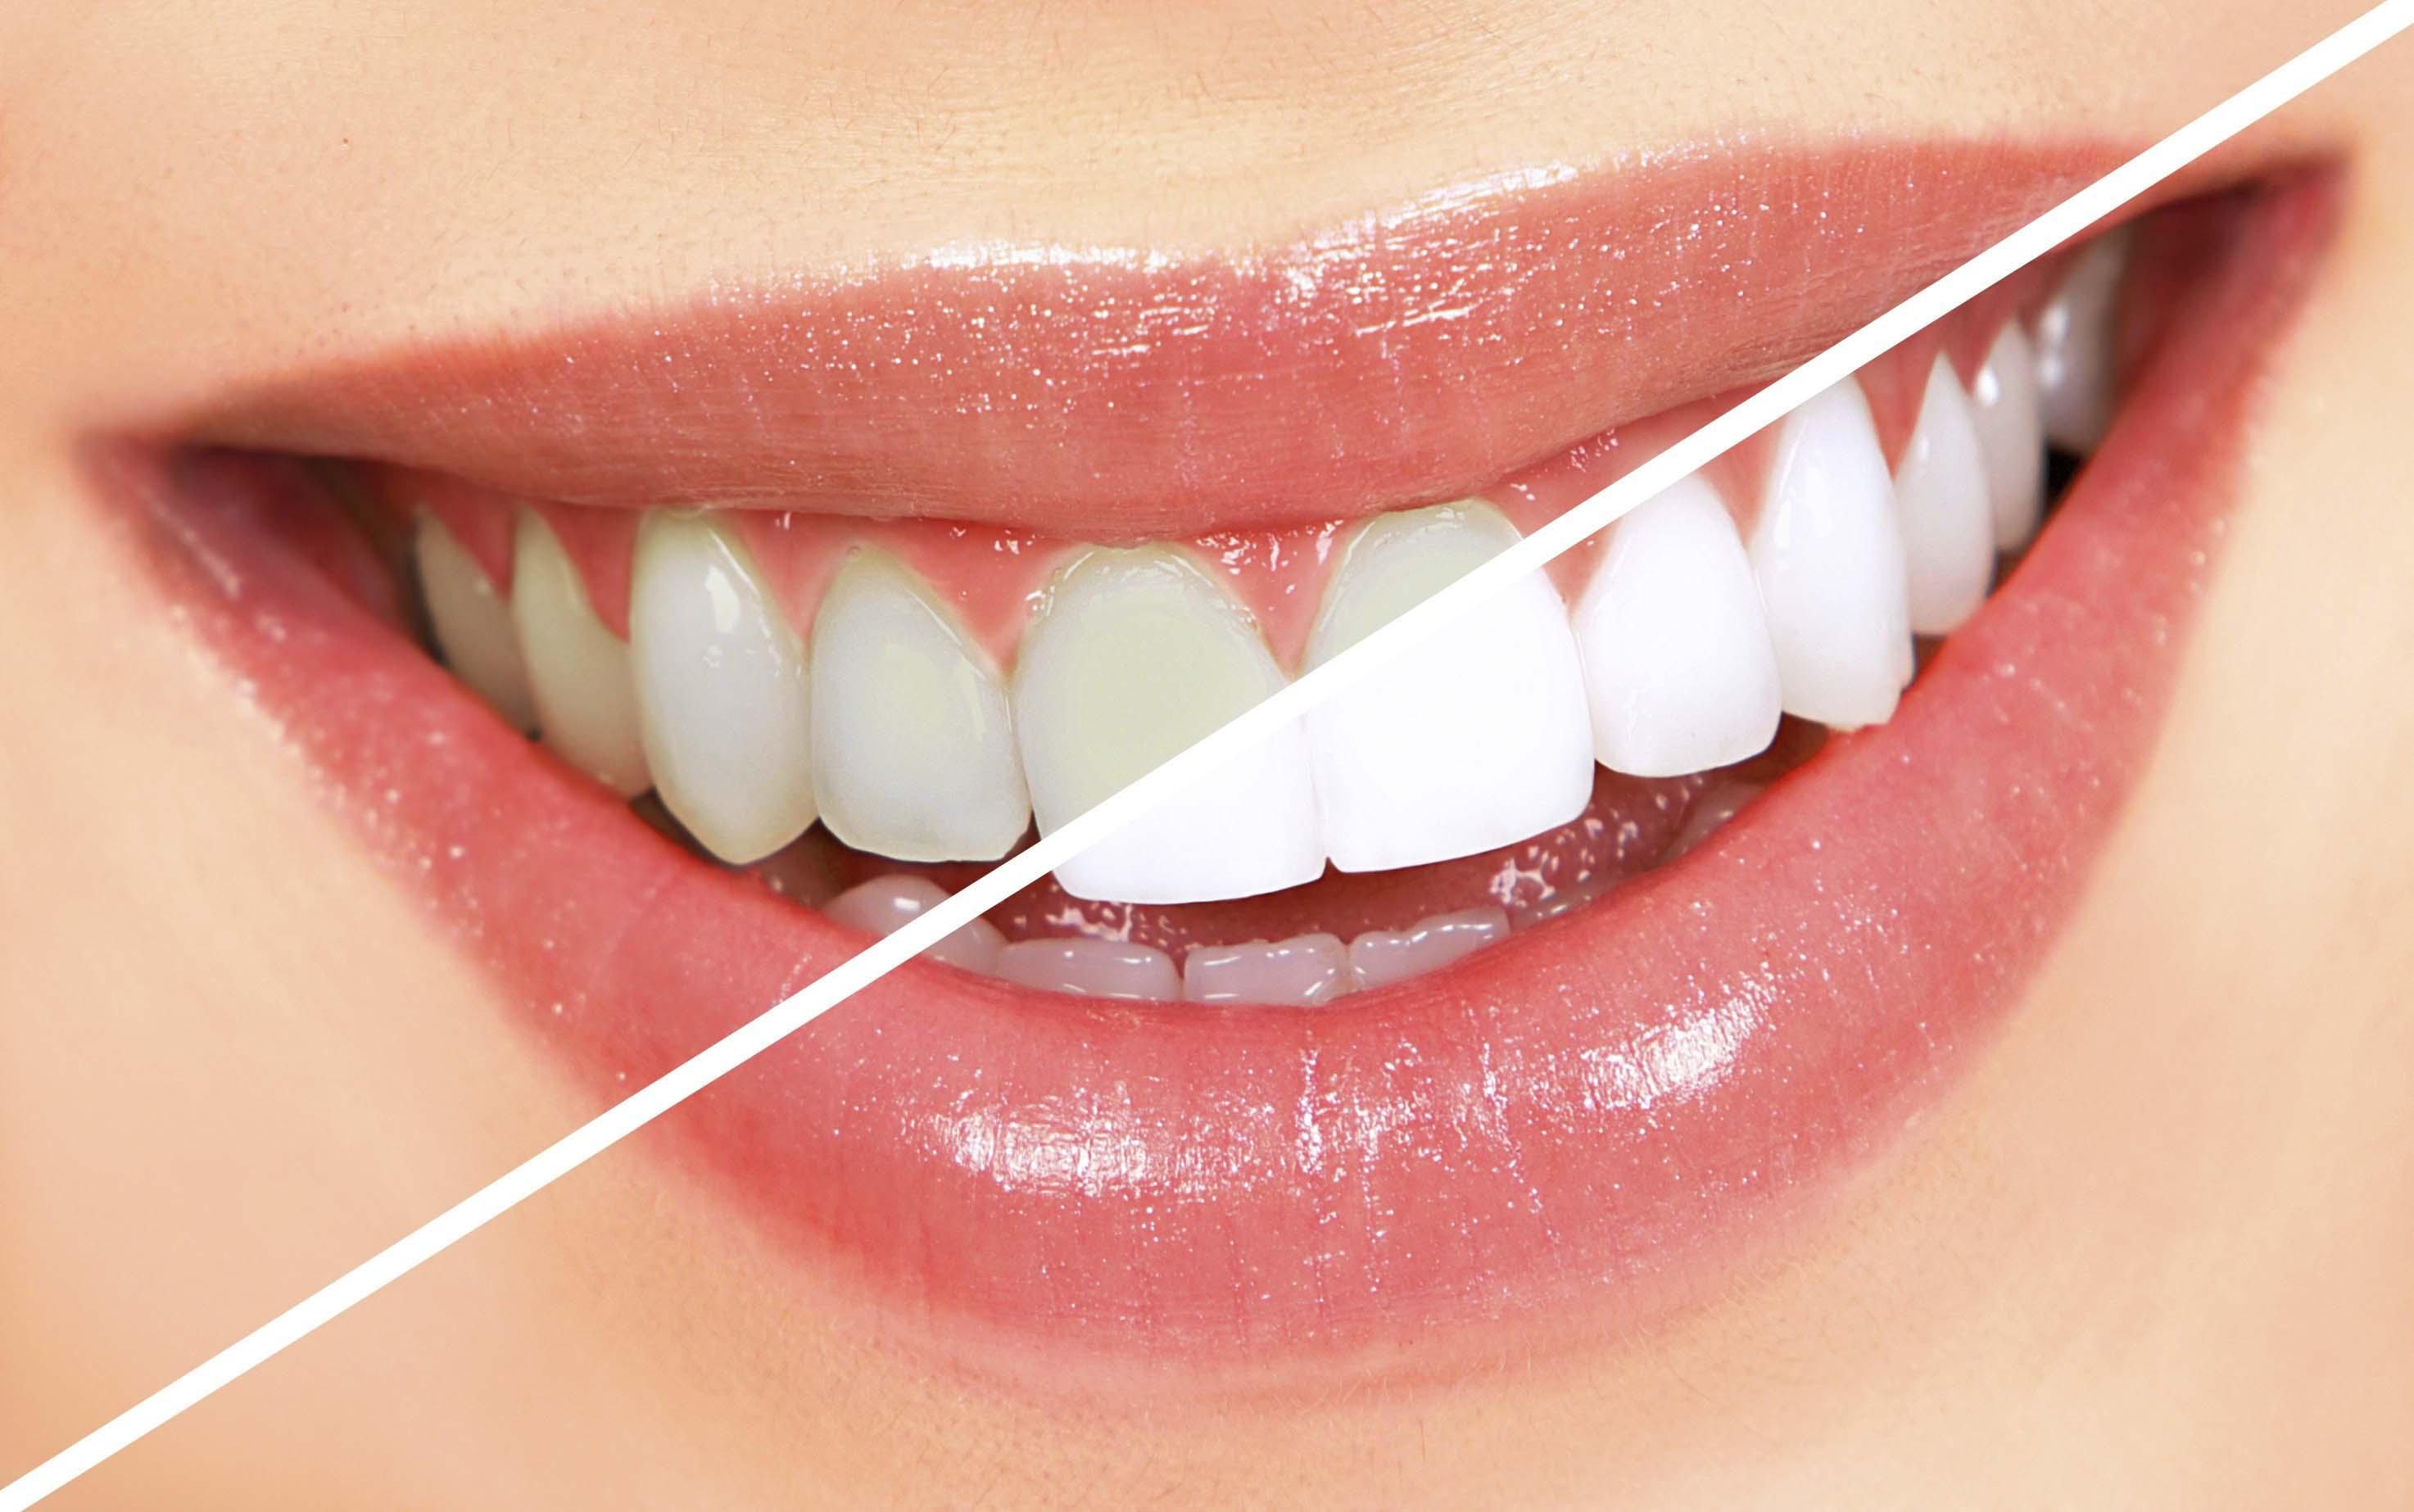 Pinellas-Park-Florida-teeth-whitening.JPG